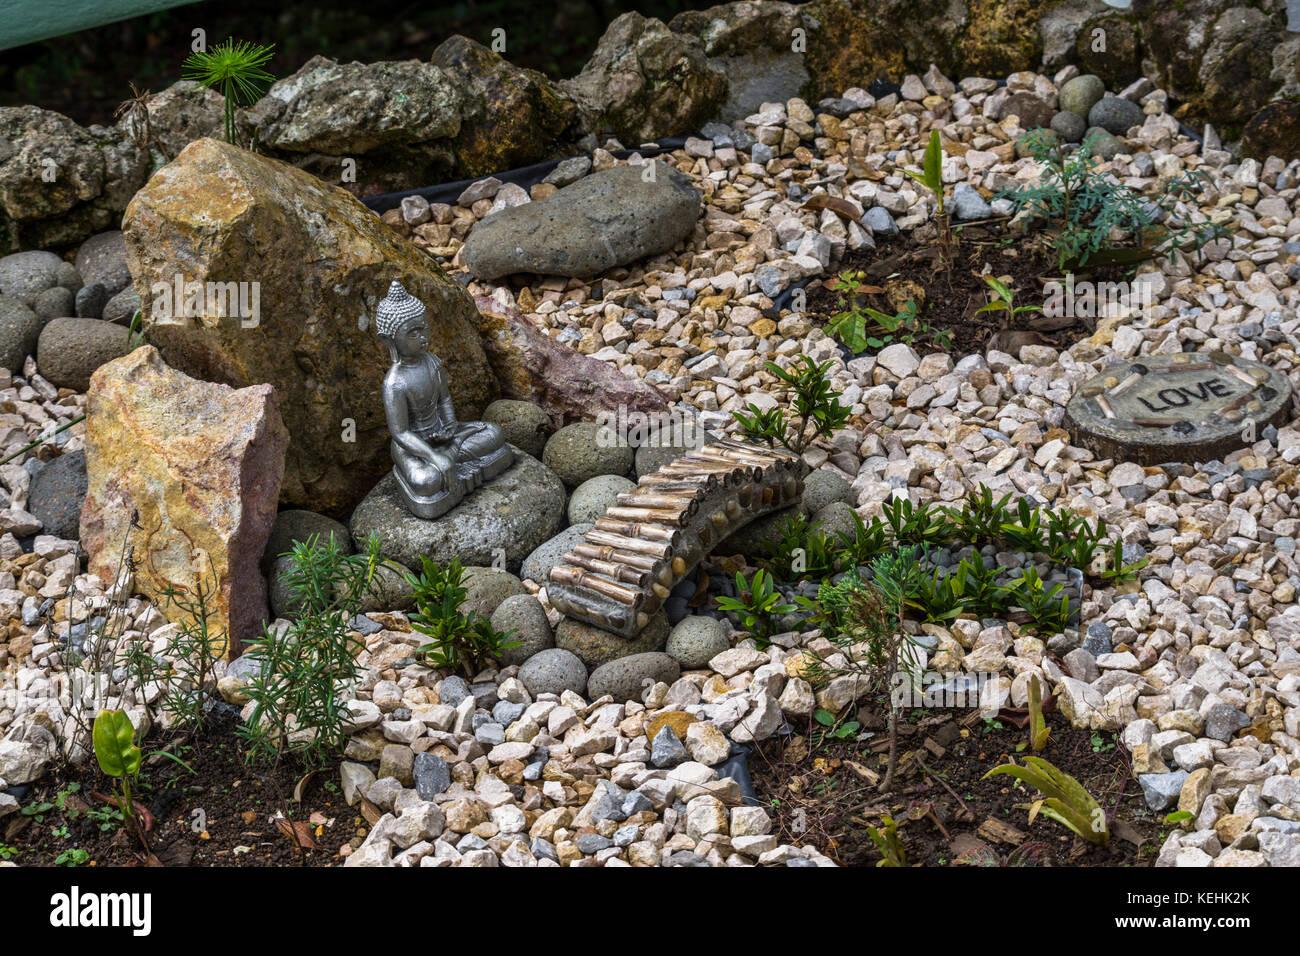 https www alamyimages fr photo image idees jardin jardin zen stone avec petite statue de bouddha assis 163886651 html